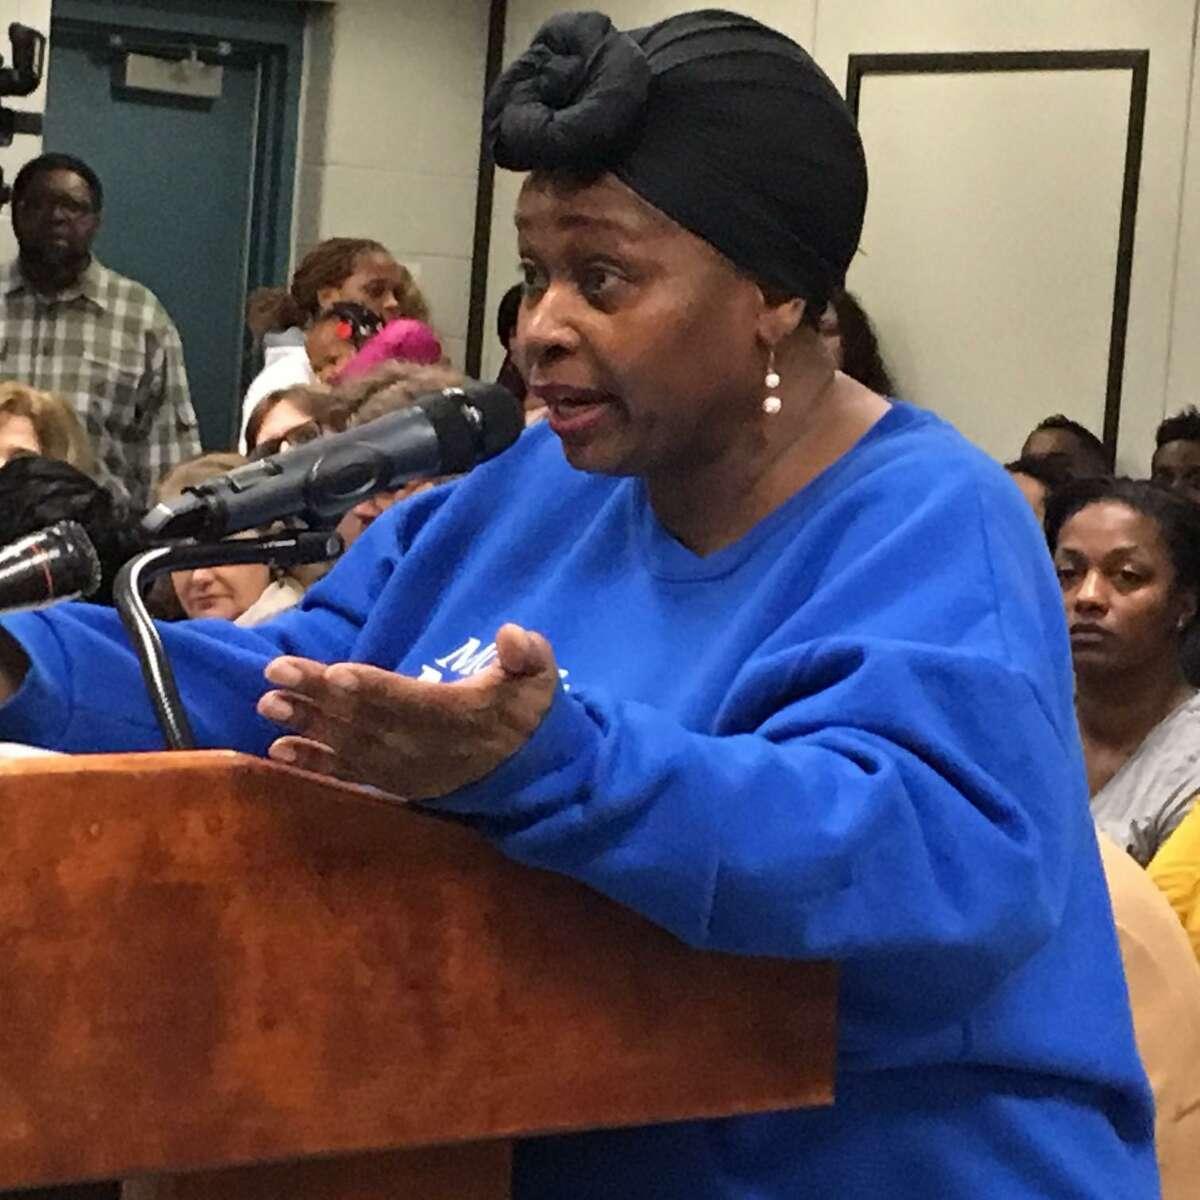 Wanda Simmons loses appeal for house run.